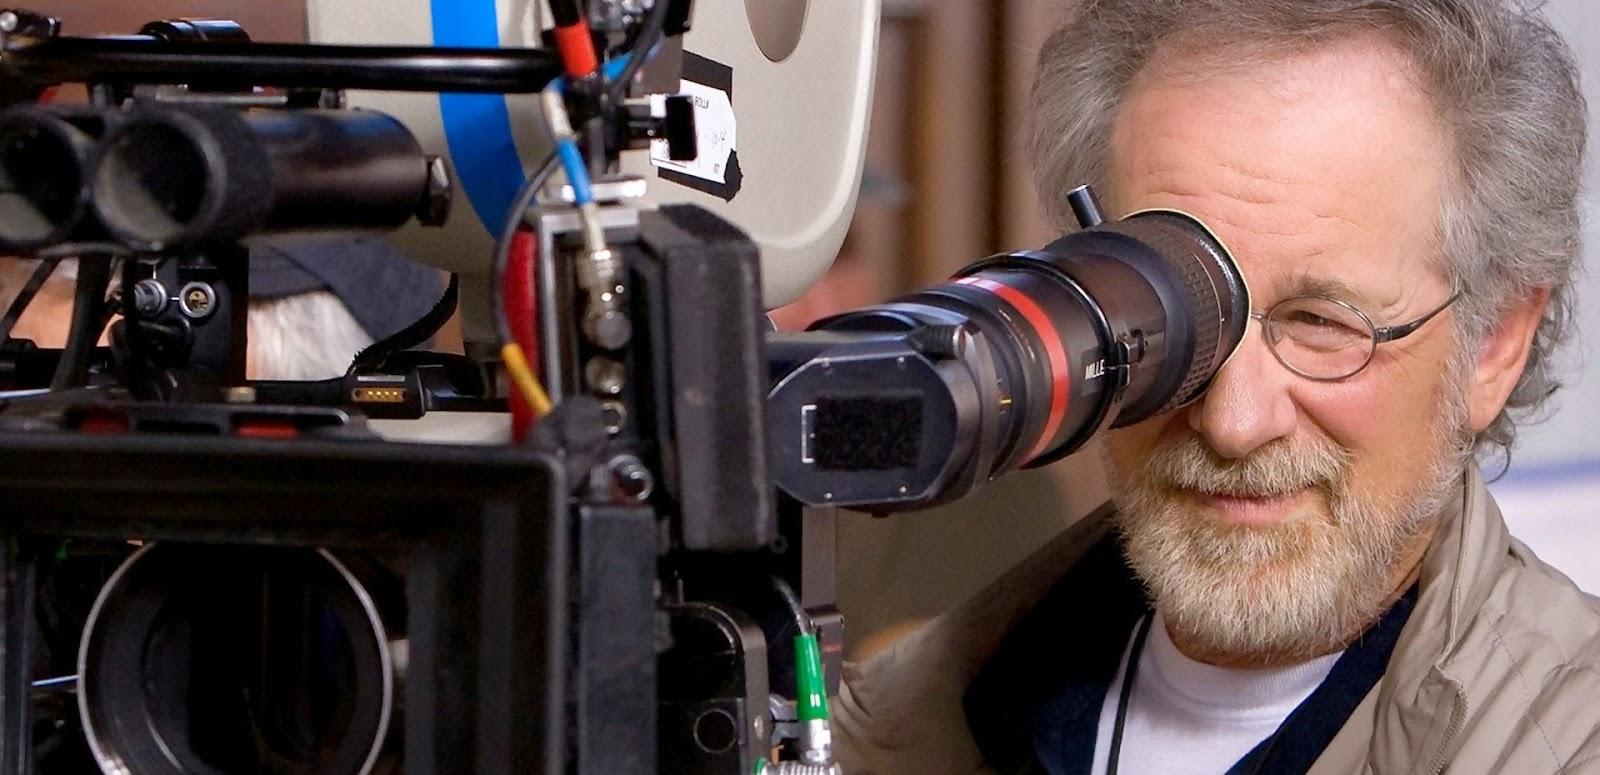 Vídeo homenageia filmes de Steven Spielberg